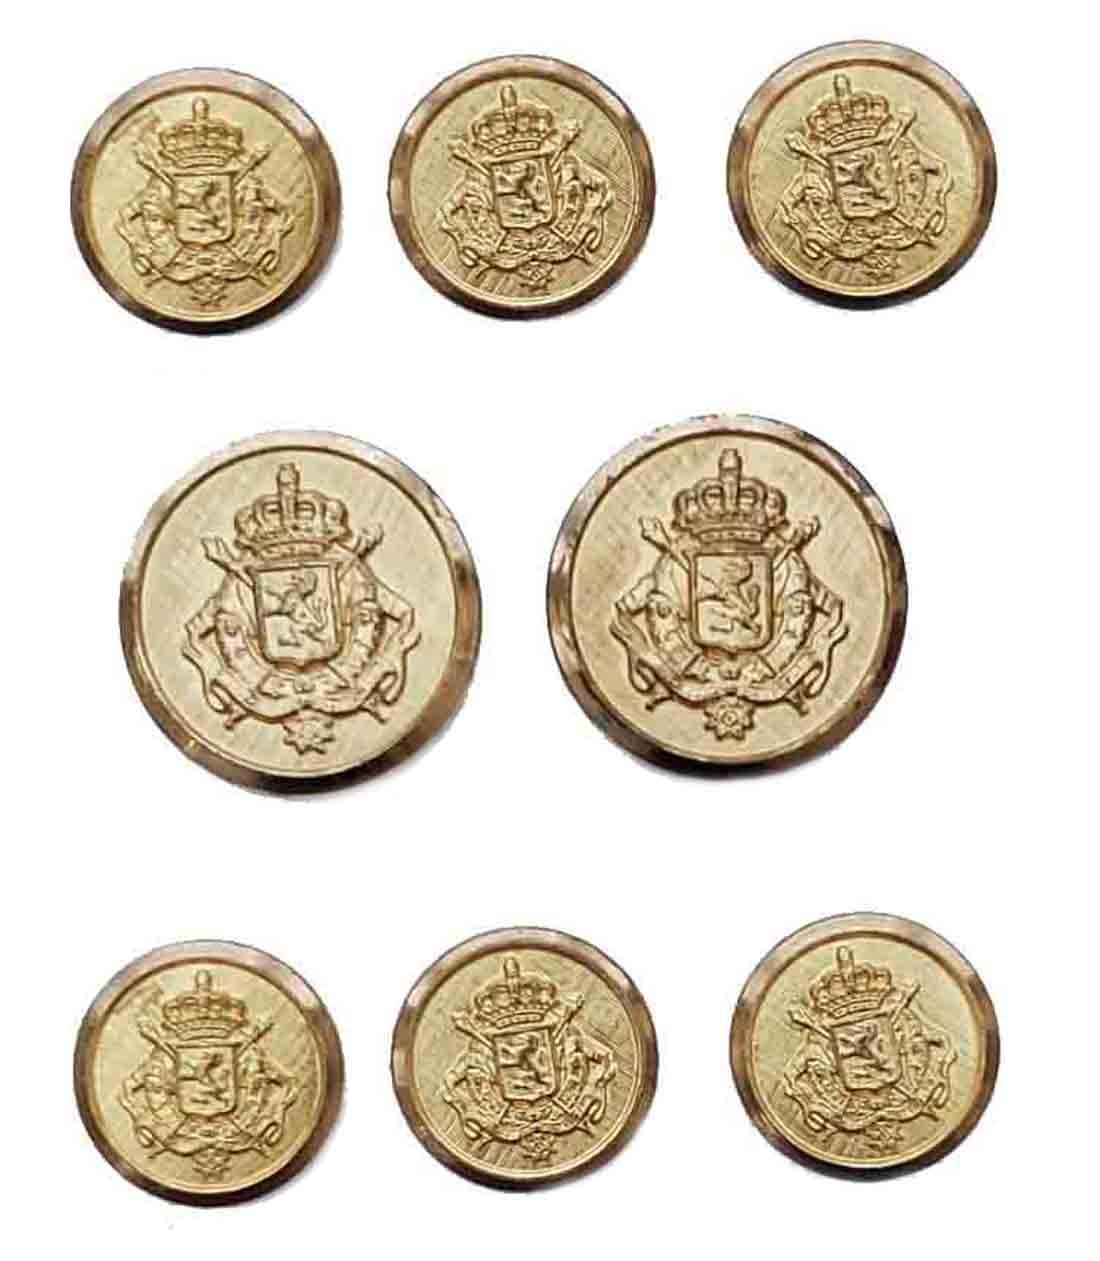 Vintage Waterbury Blazer Buttons Set Gold Brass Shank Crown and Shield Men's